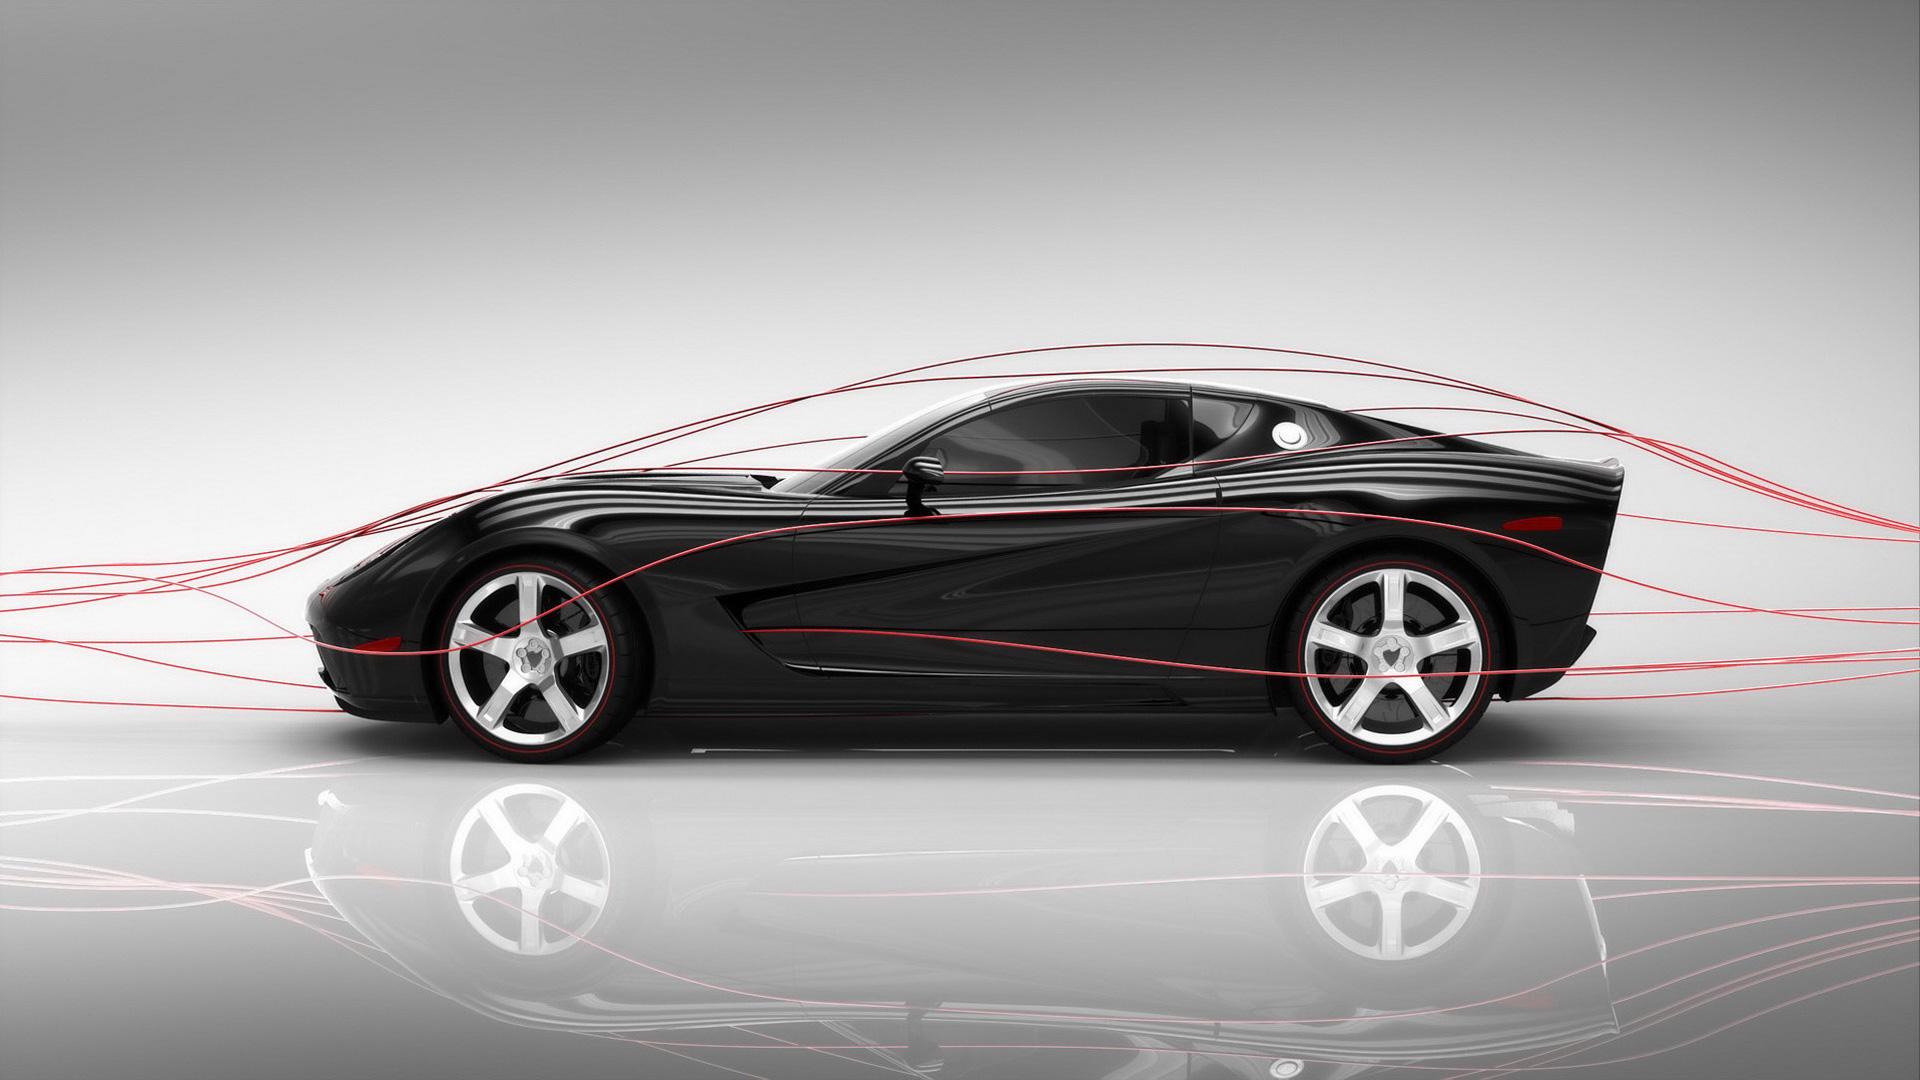 corvette mallett super car wallpapers hd wallpapers - Super Cool Cars Wallpapers Hd